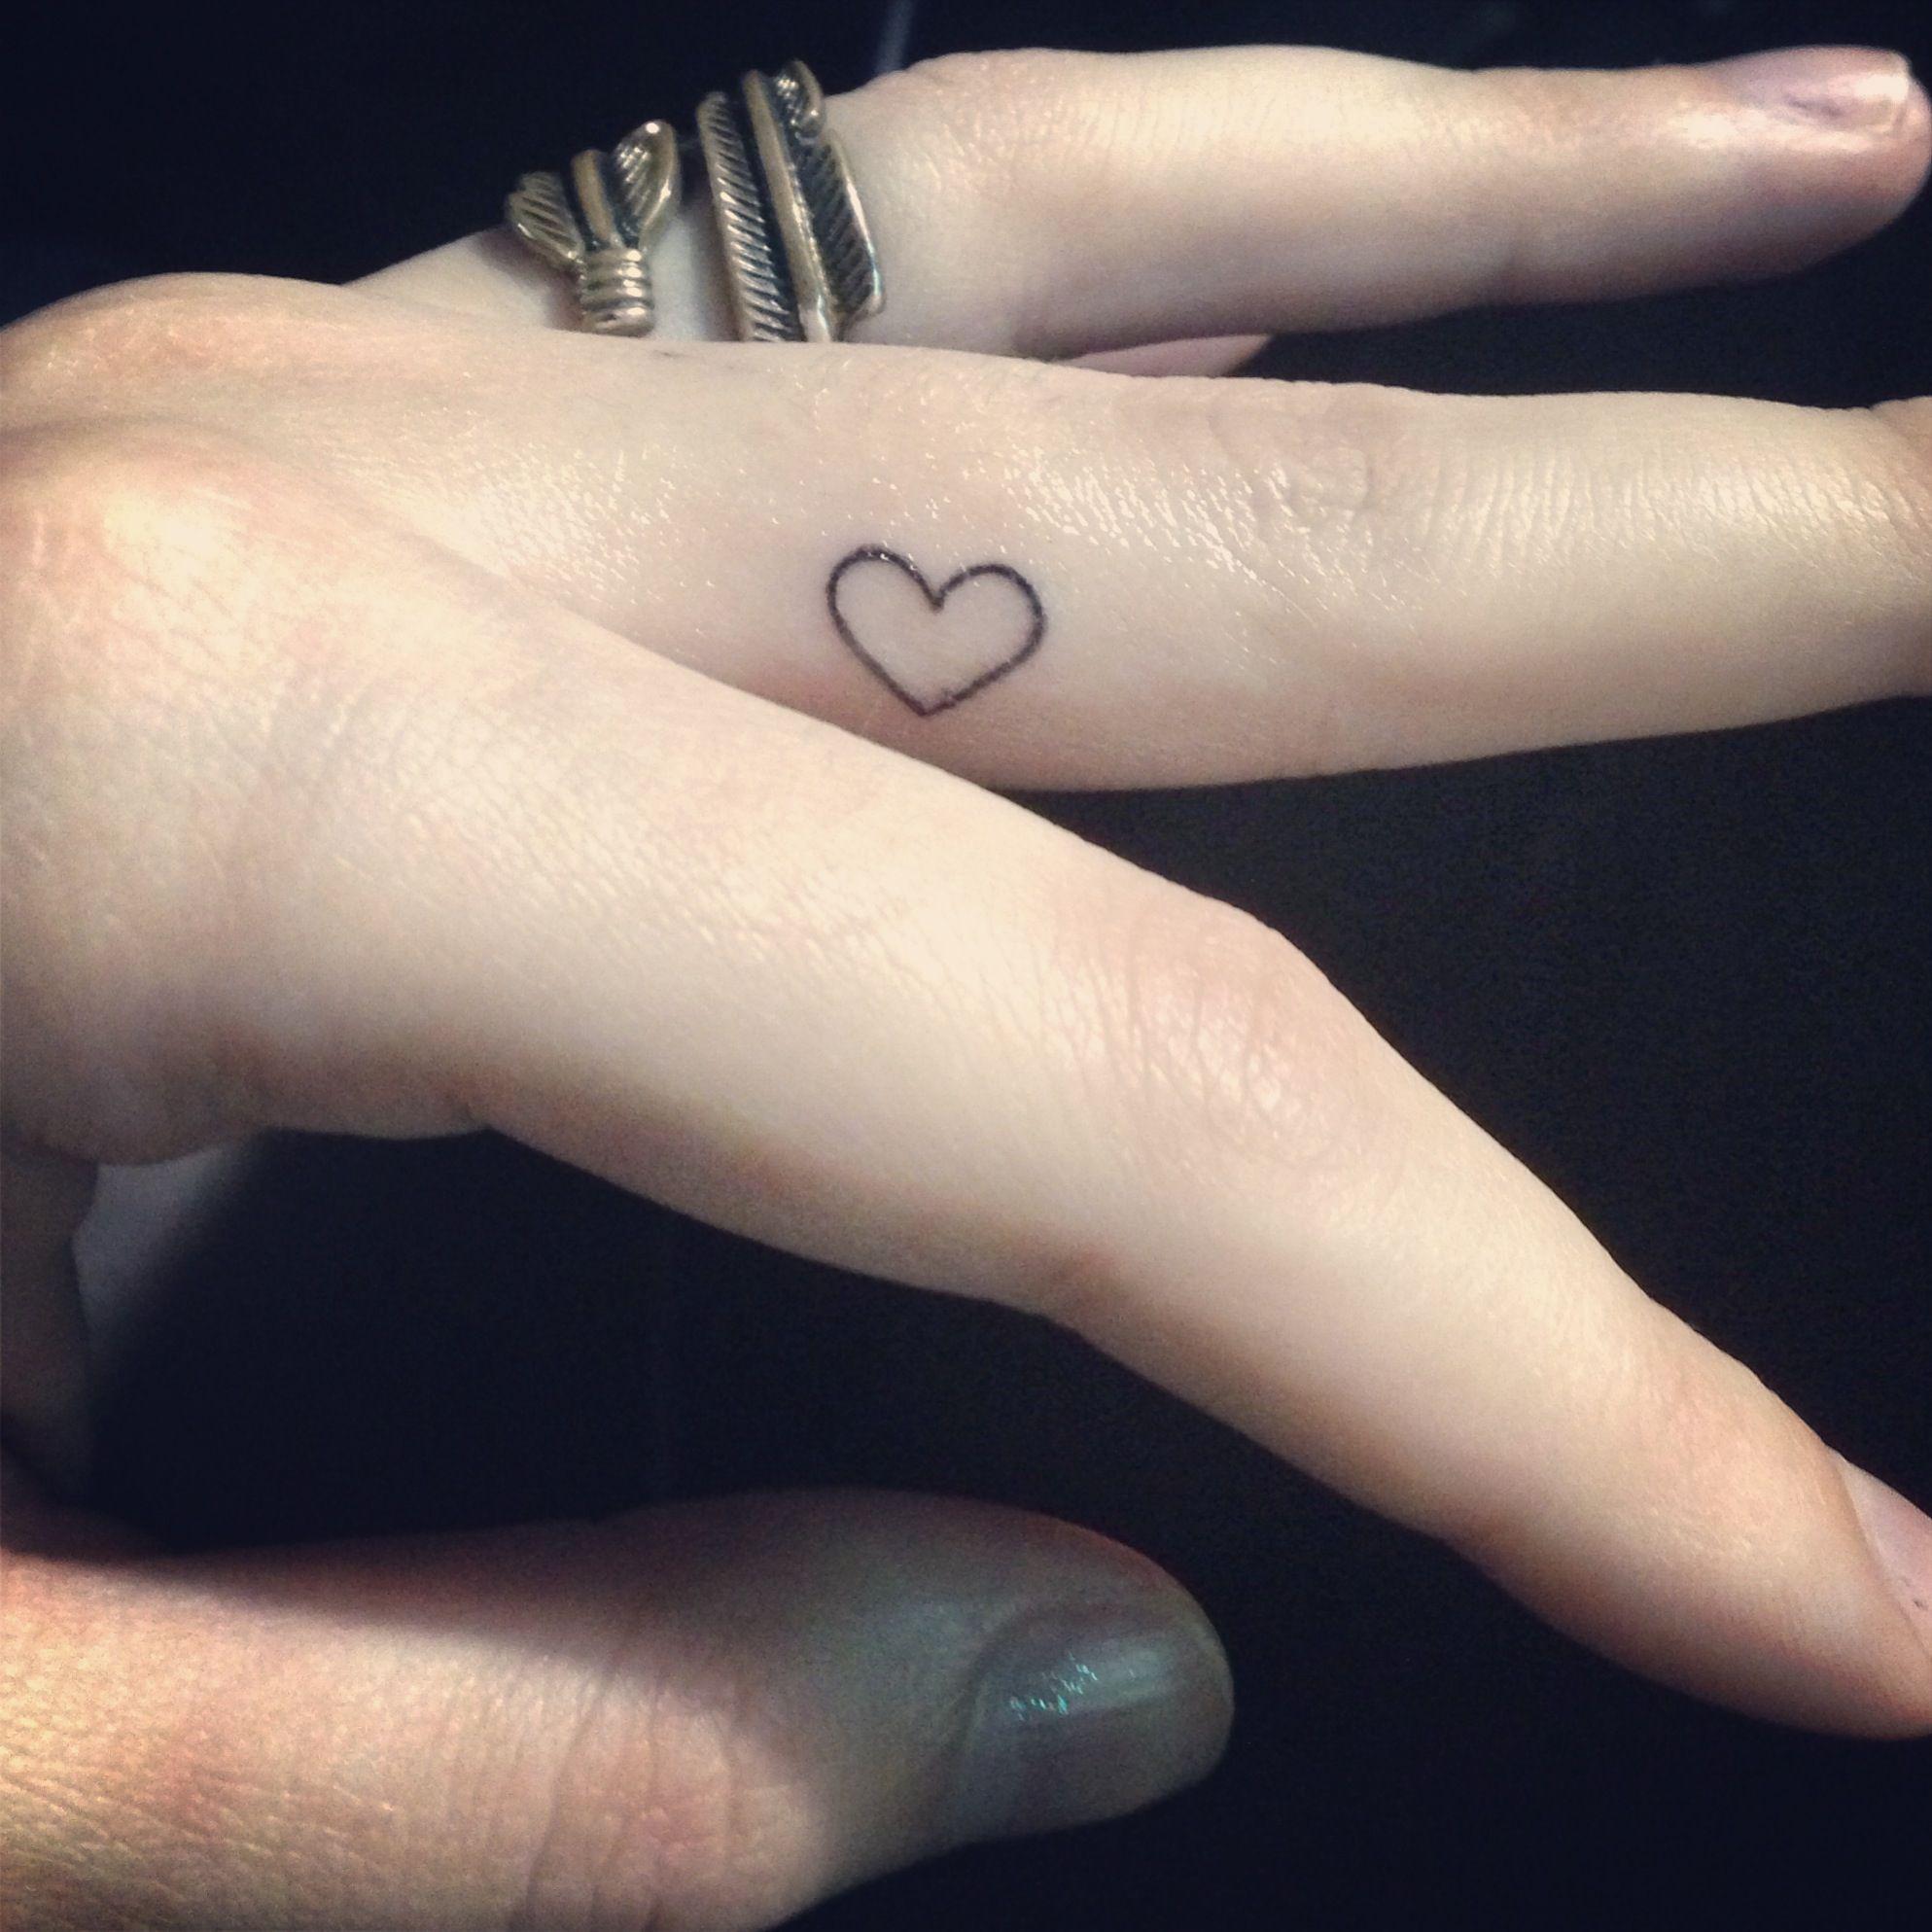 Cute heart finger tattoo tattoos pinterest - Tatouage interieur doigt ...